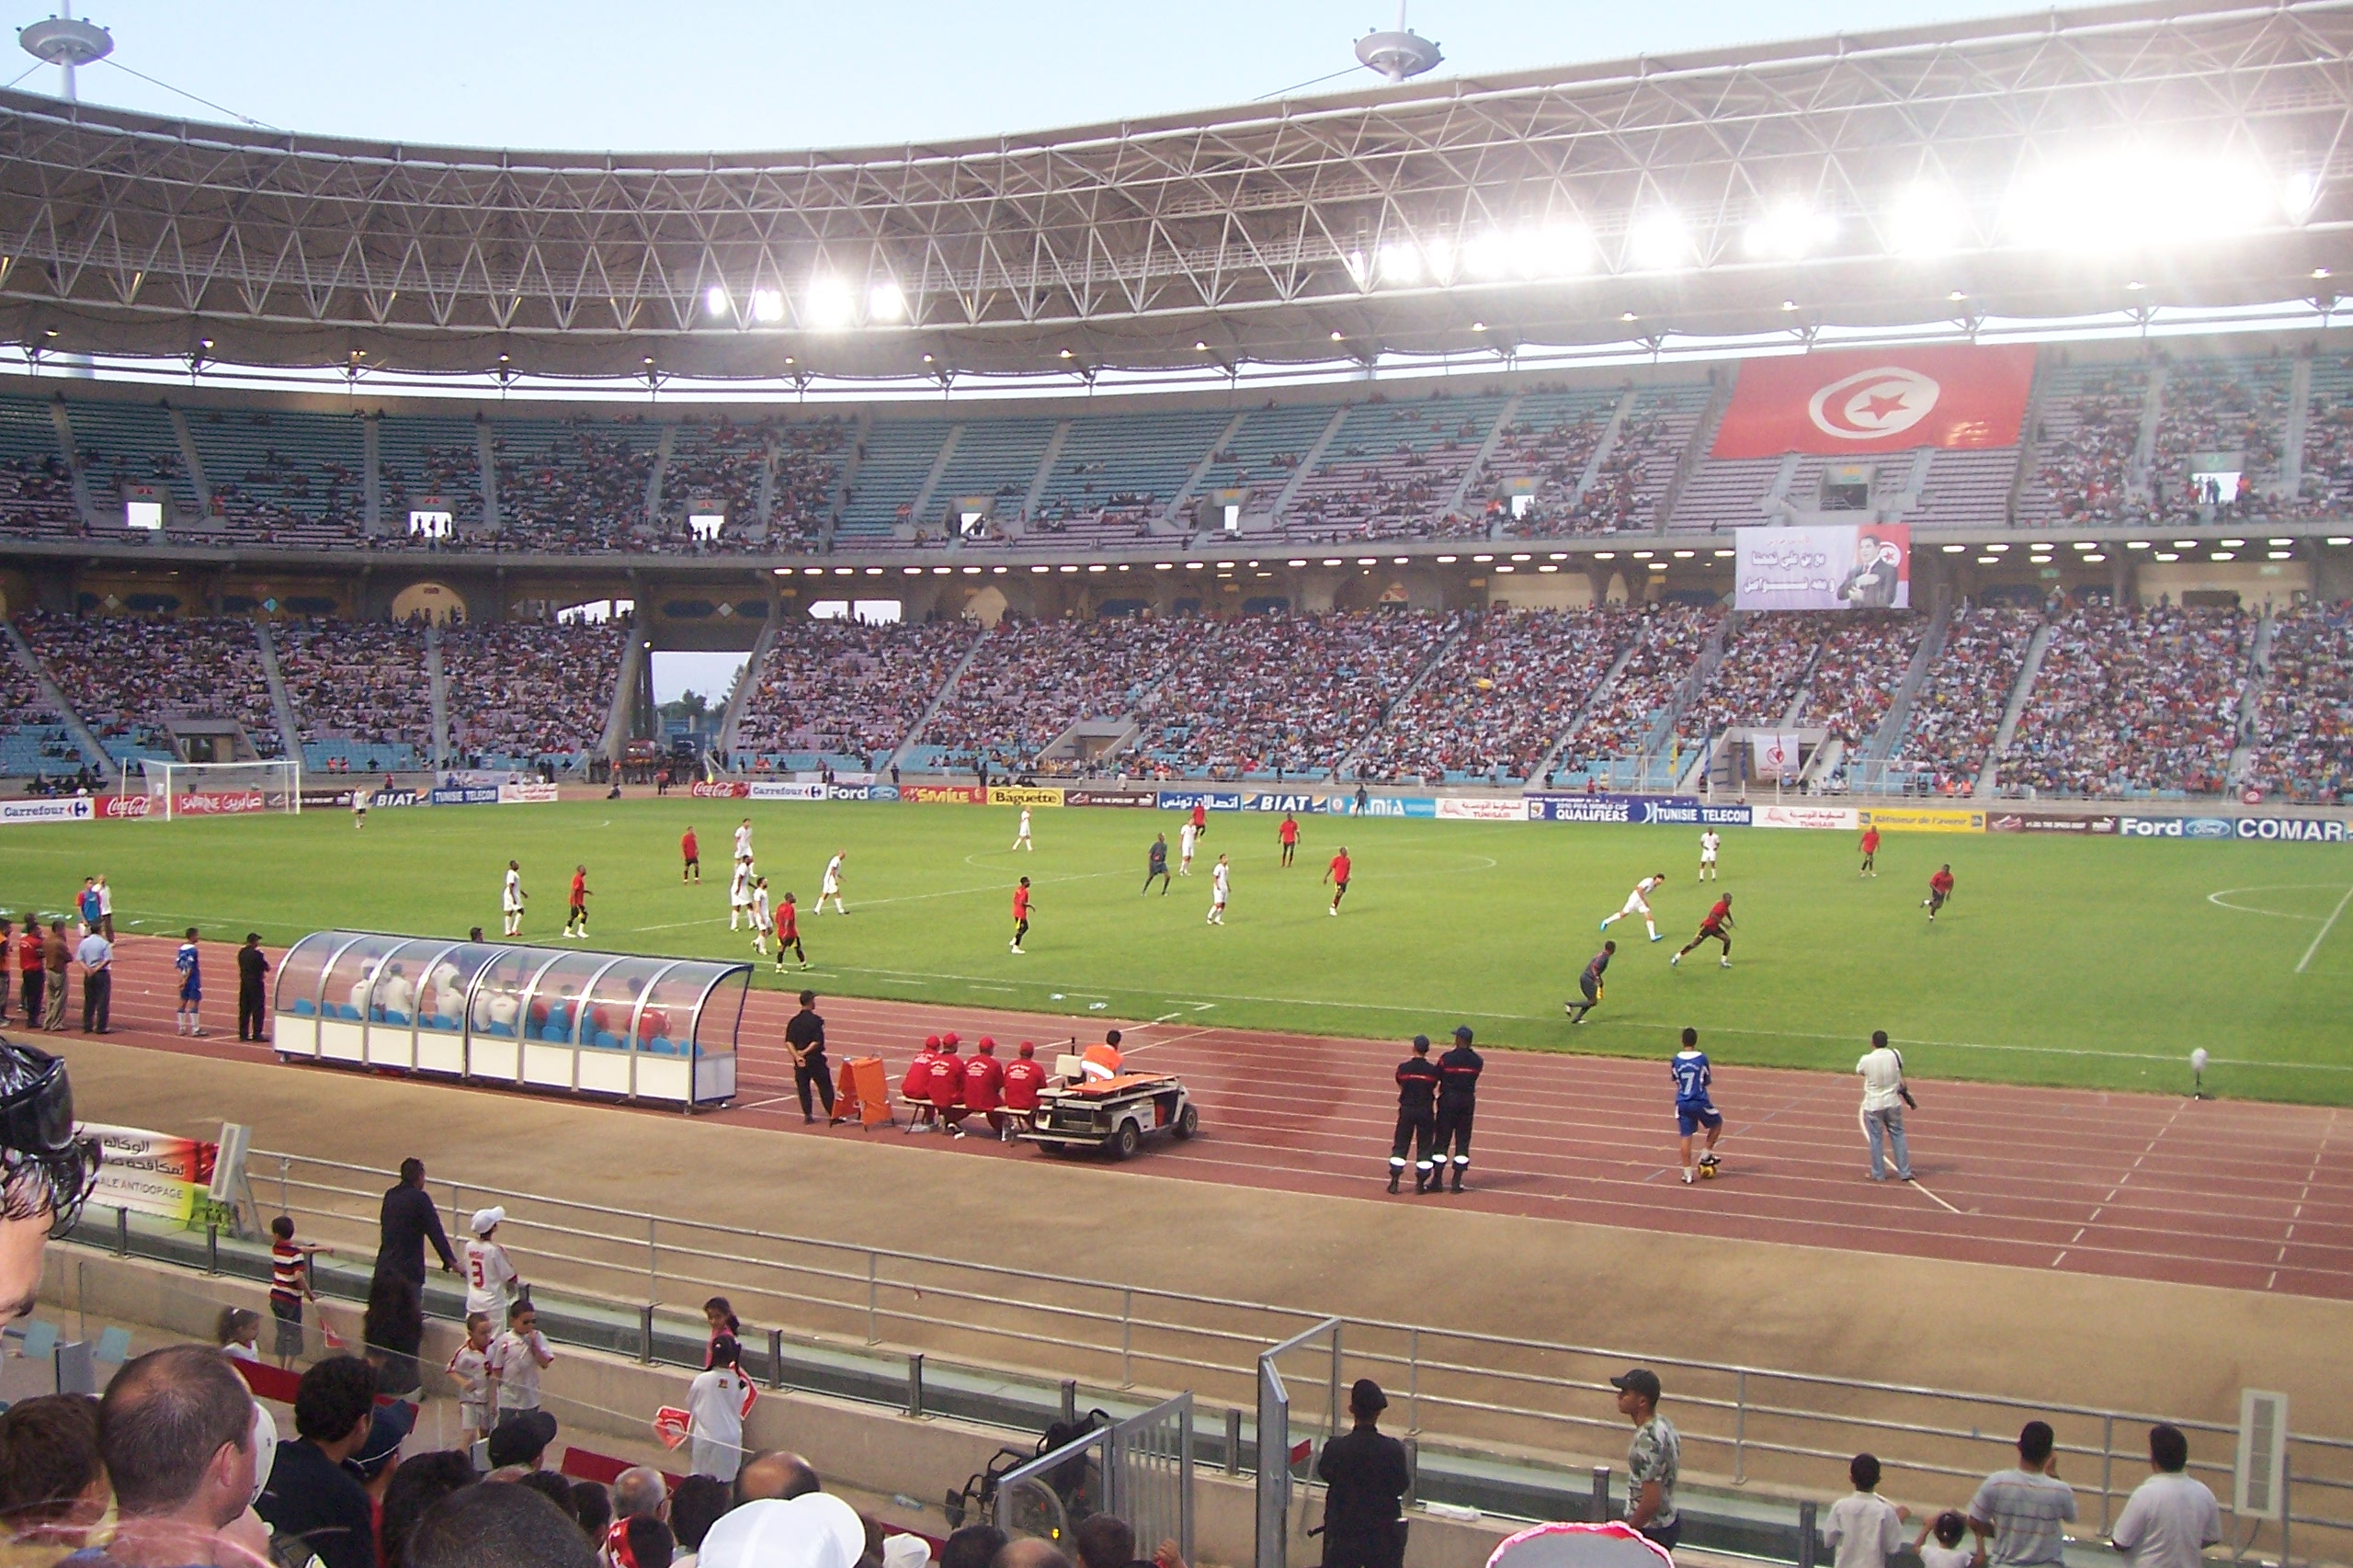 Estadio ol mpico de rad s wikiwand for Porte 8 stade rades